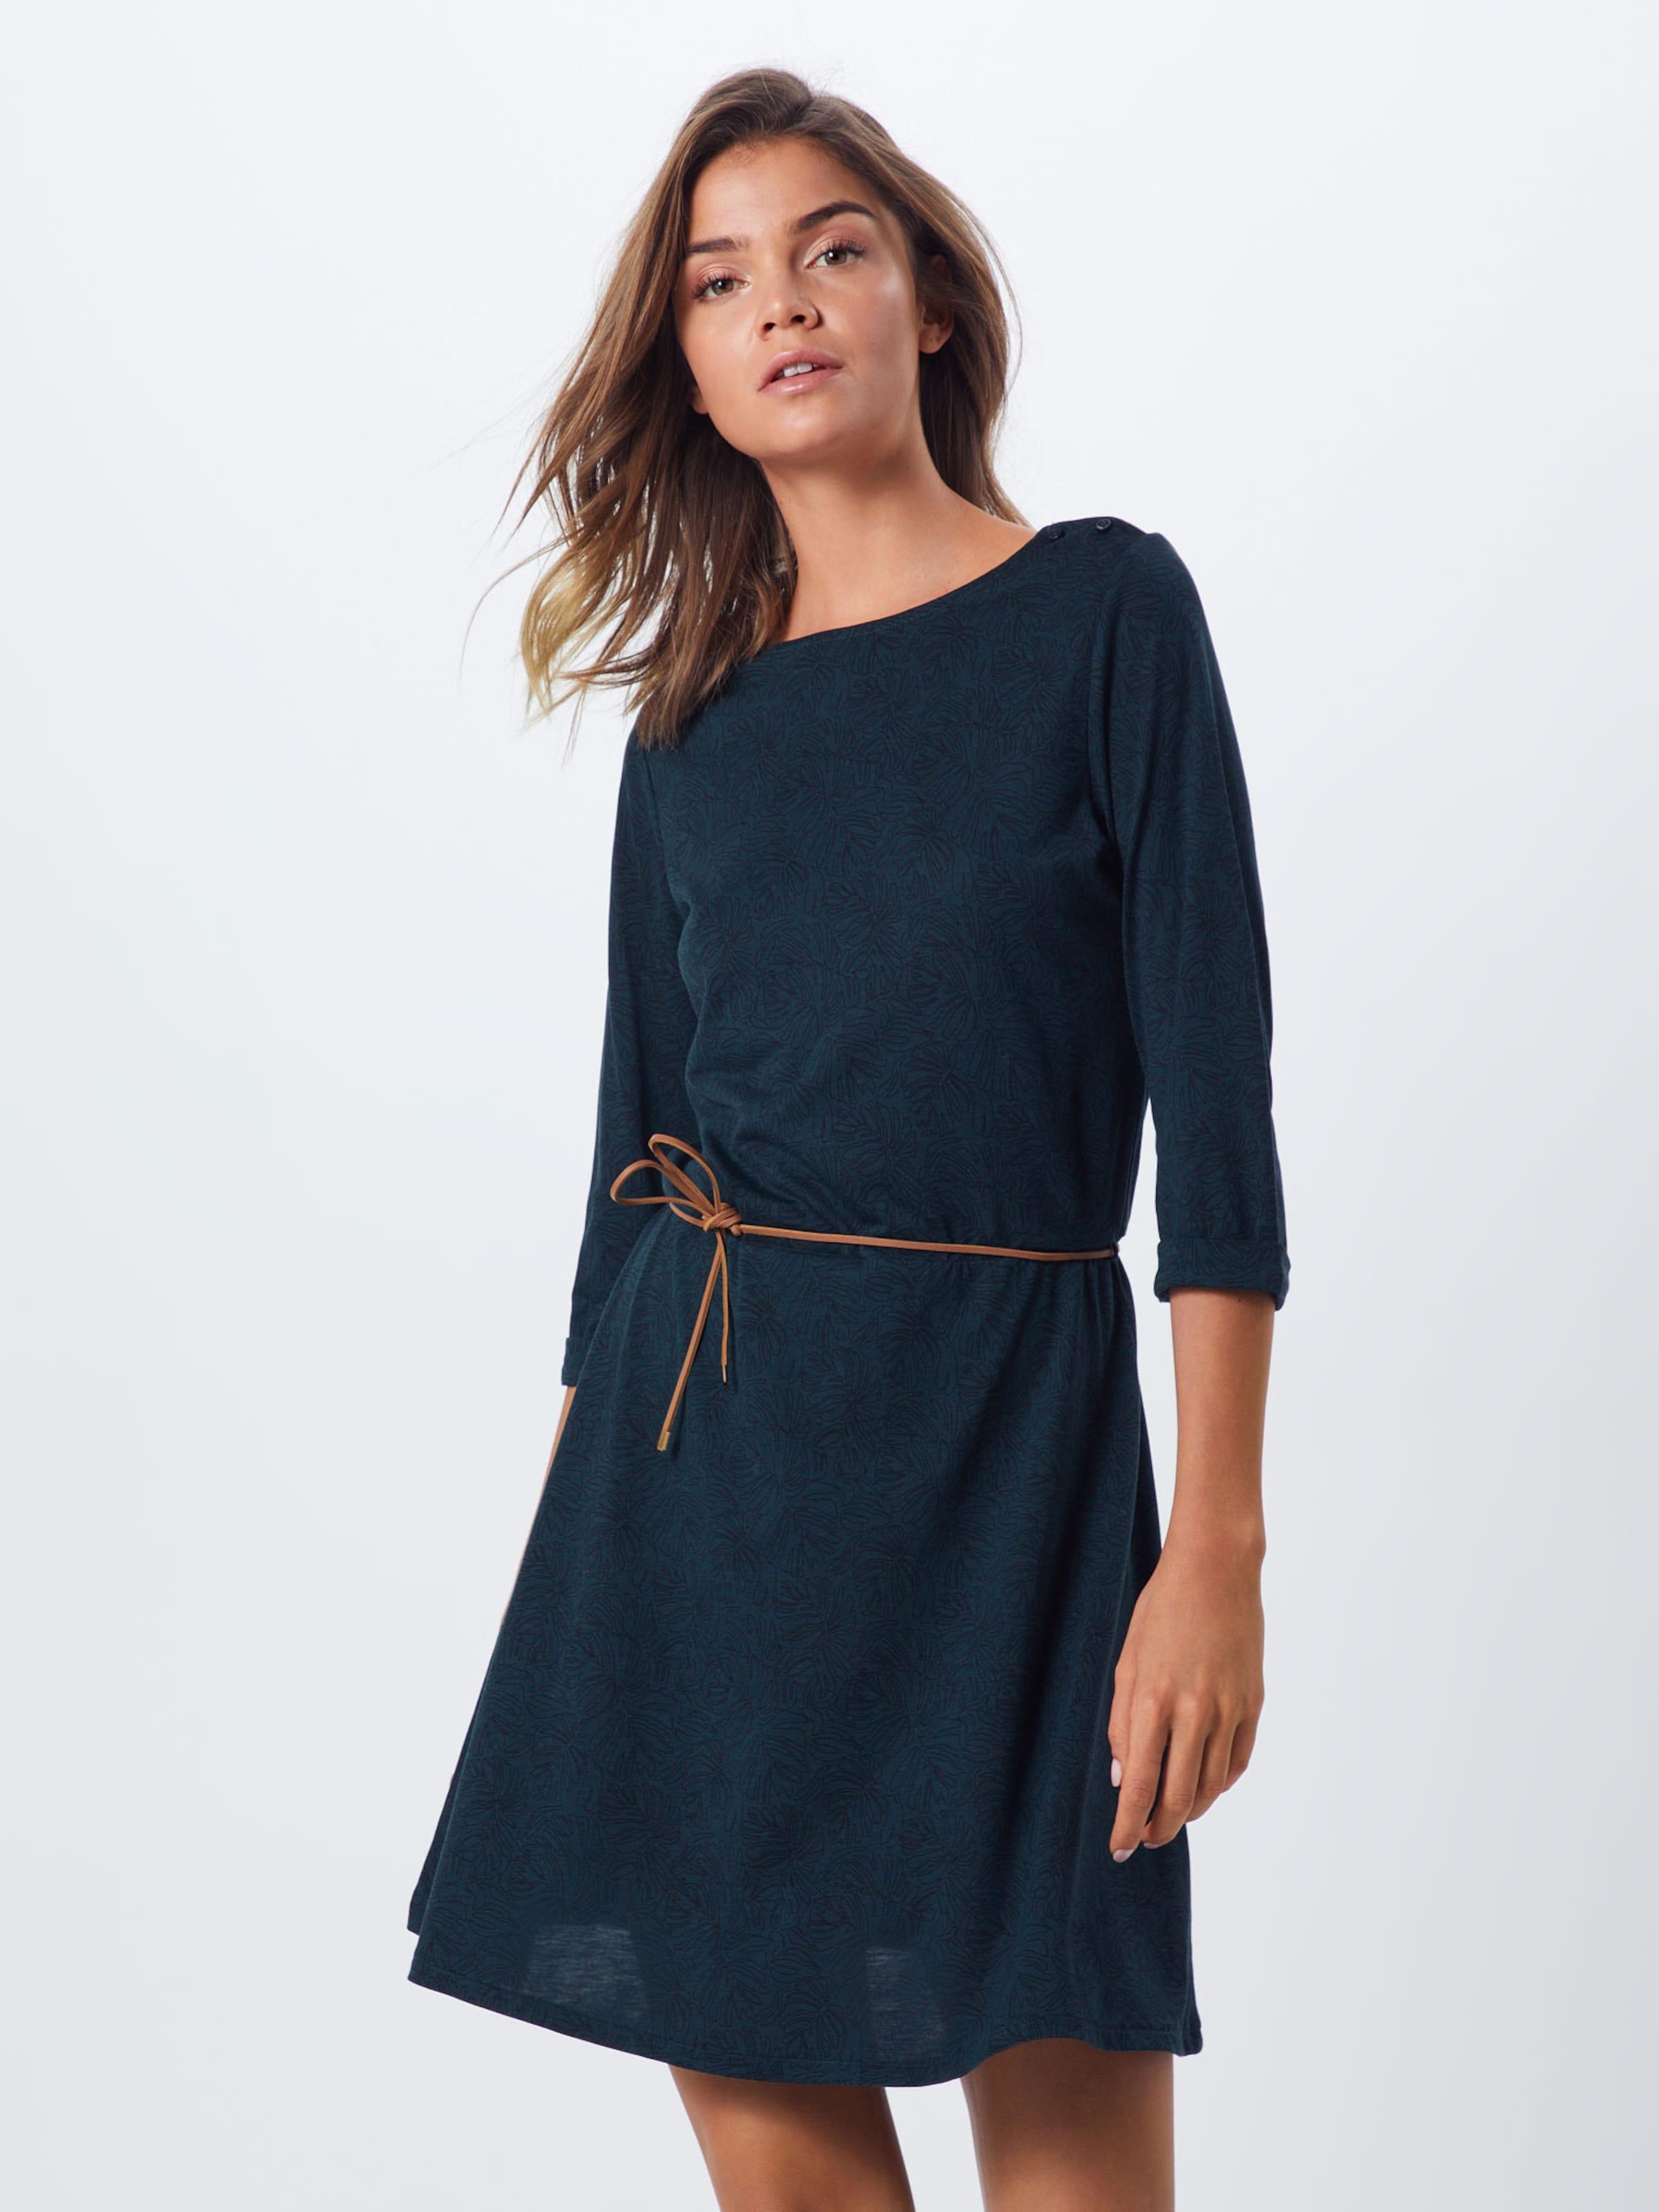 Sessun Kleid Kleid Kleid In In Sessun Sessun Sessun In Dunkelgrün Dunkelgrün Dunkelgrün n0Owk8P